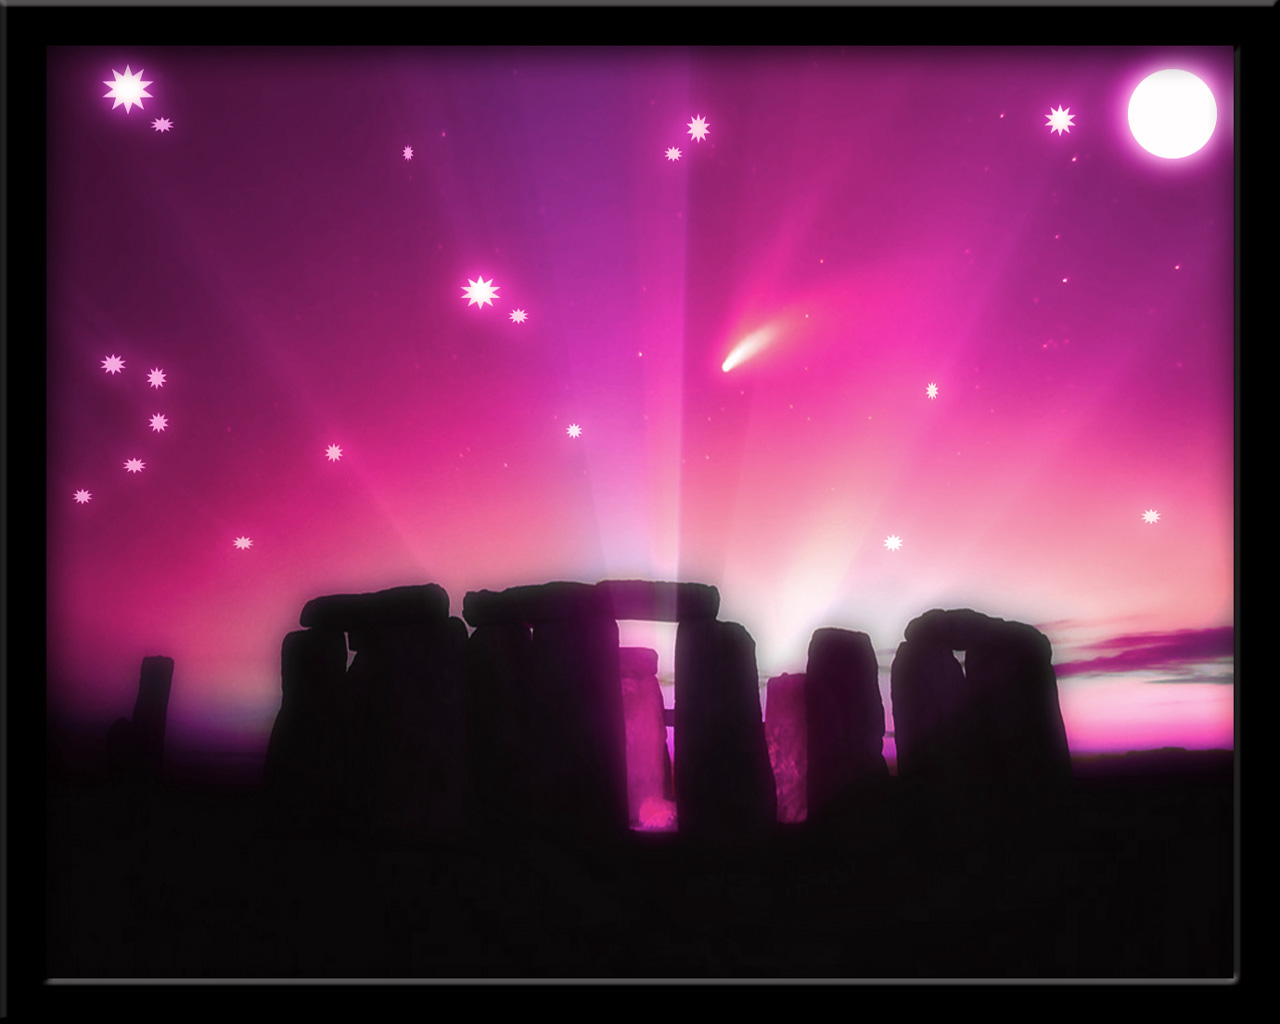 Stonehenge Midnight 5 by welshdragon